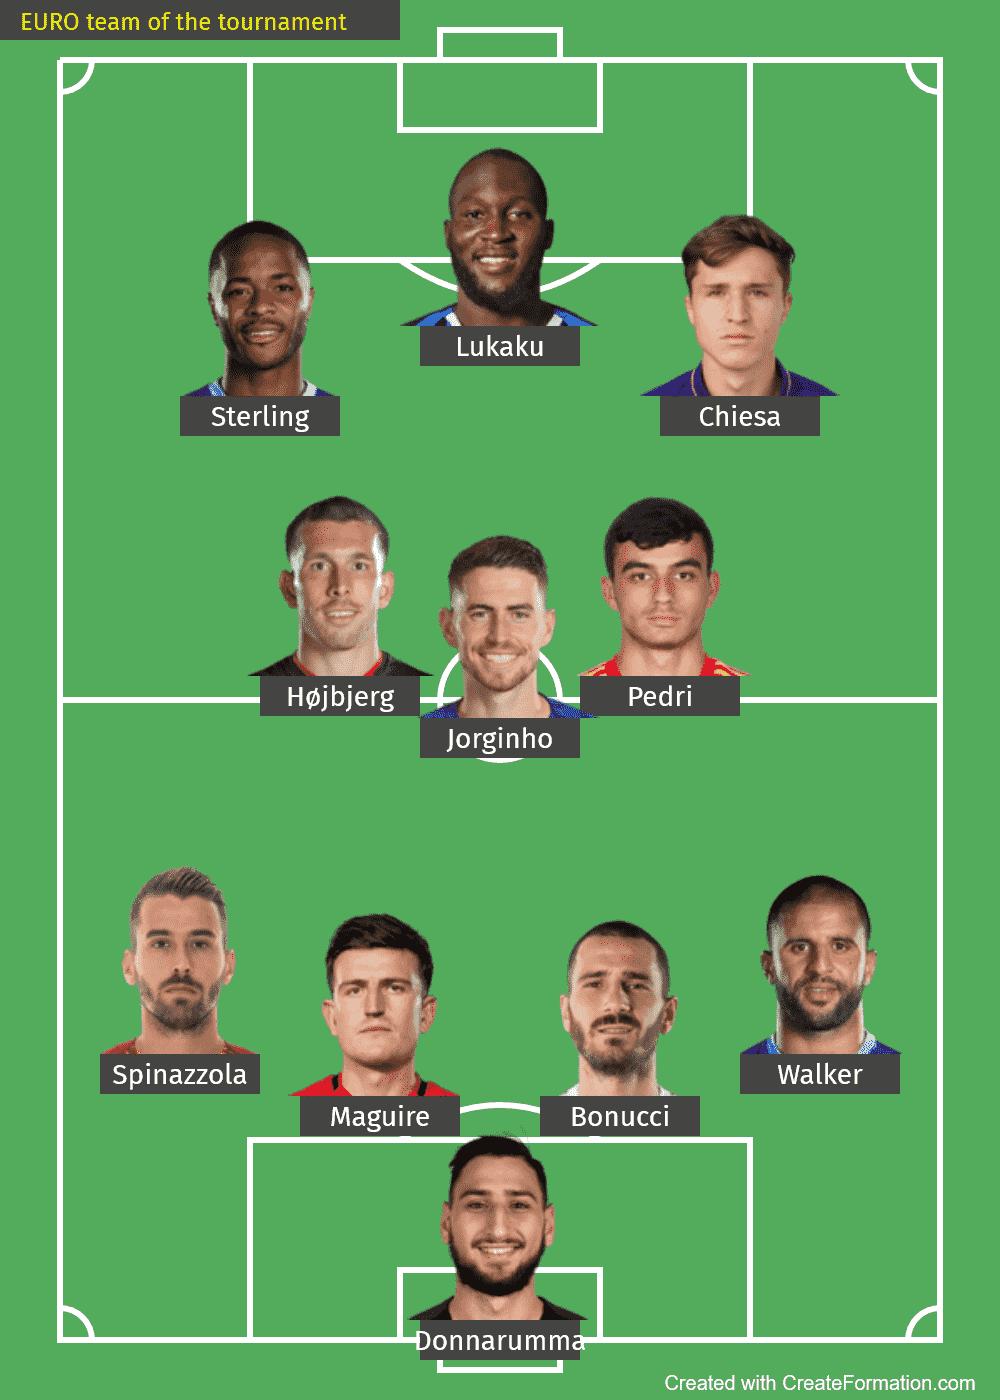 UEFA EURO 2020 team of the tournament